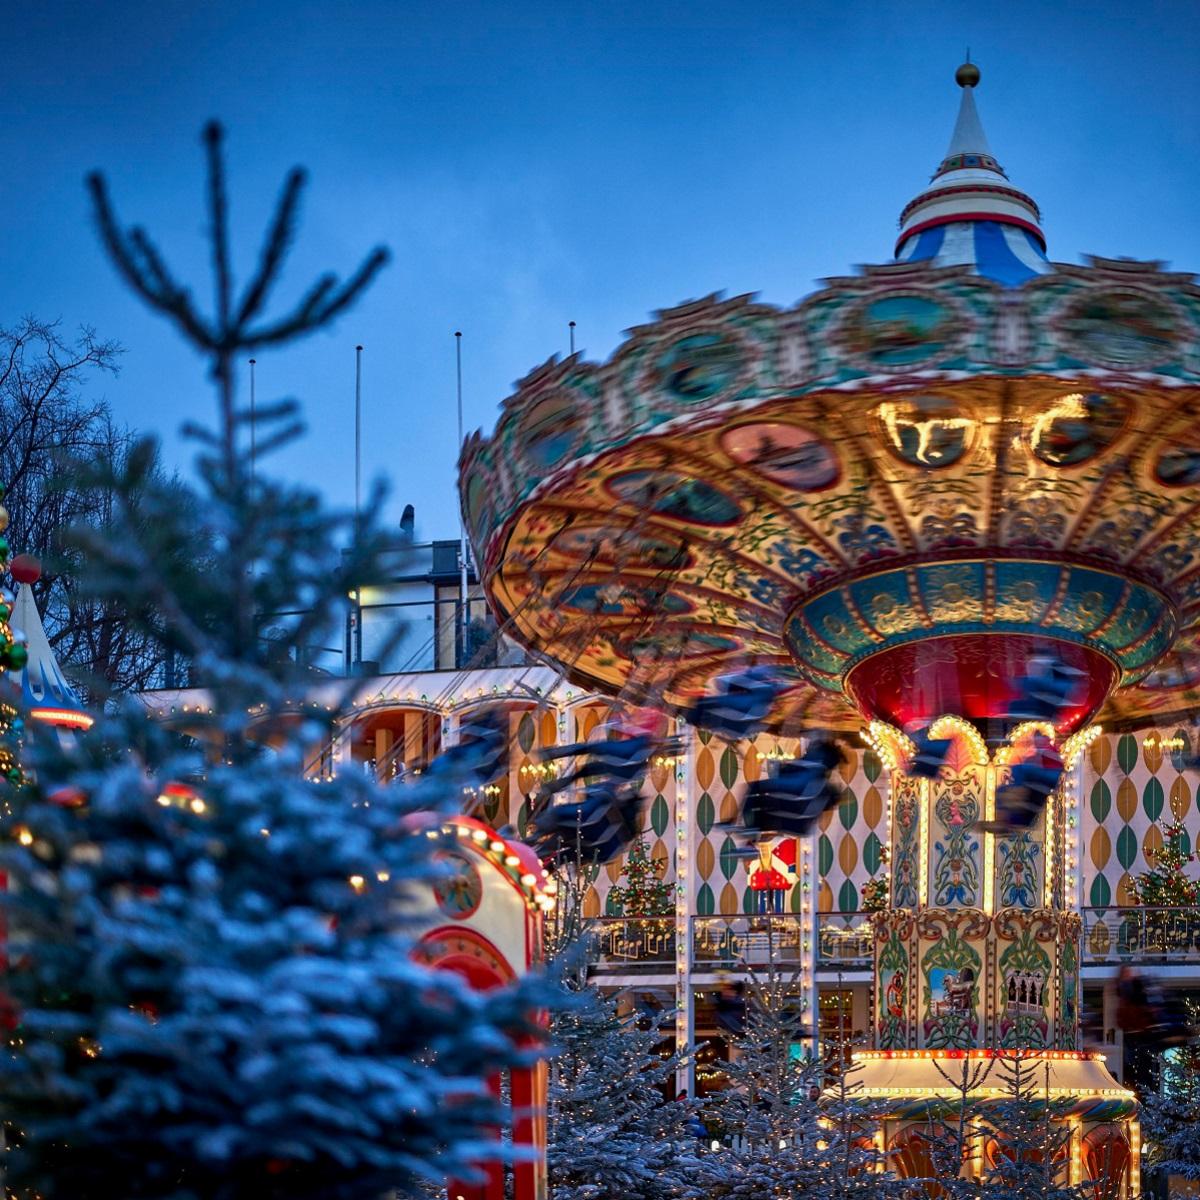 Weihnachten im Tivoli Kopenhagen 4